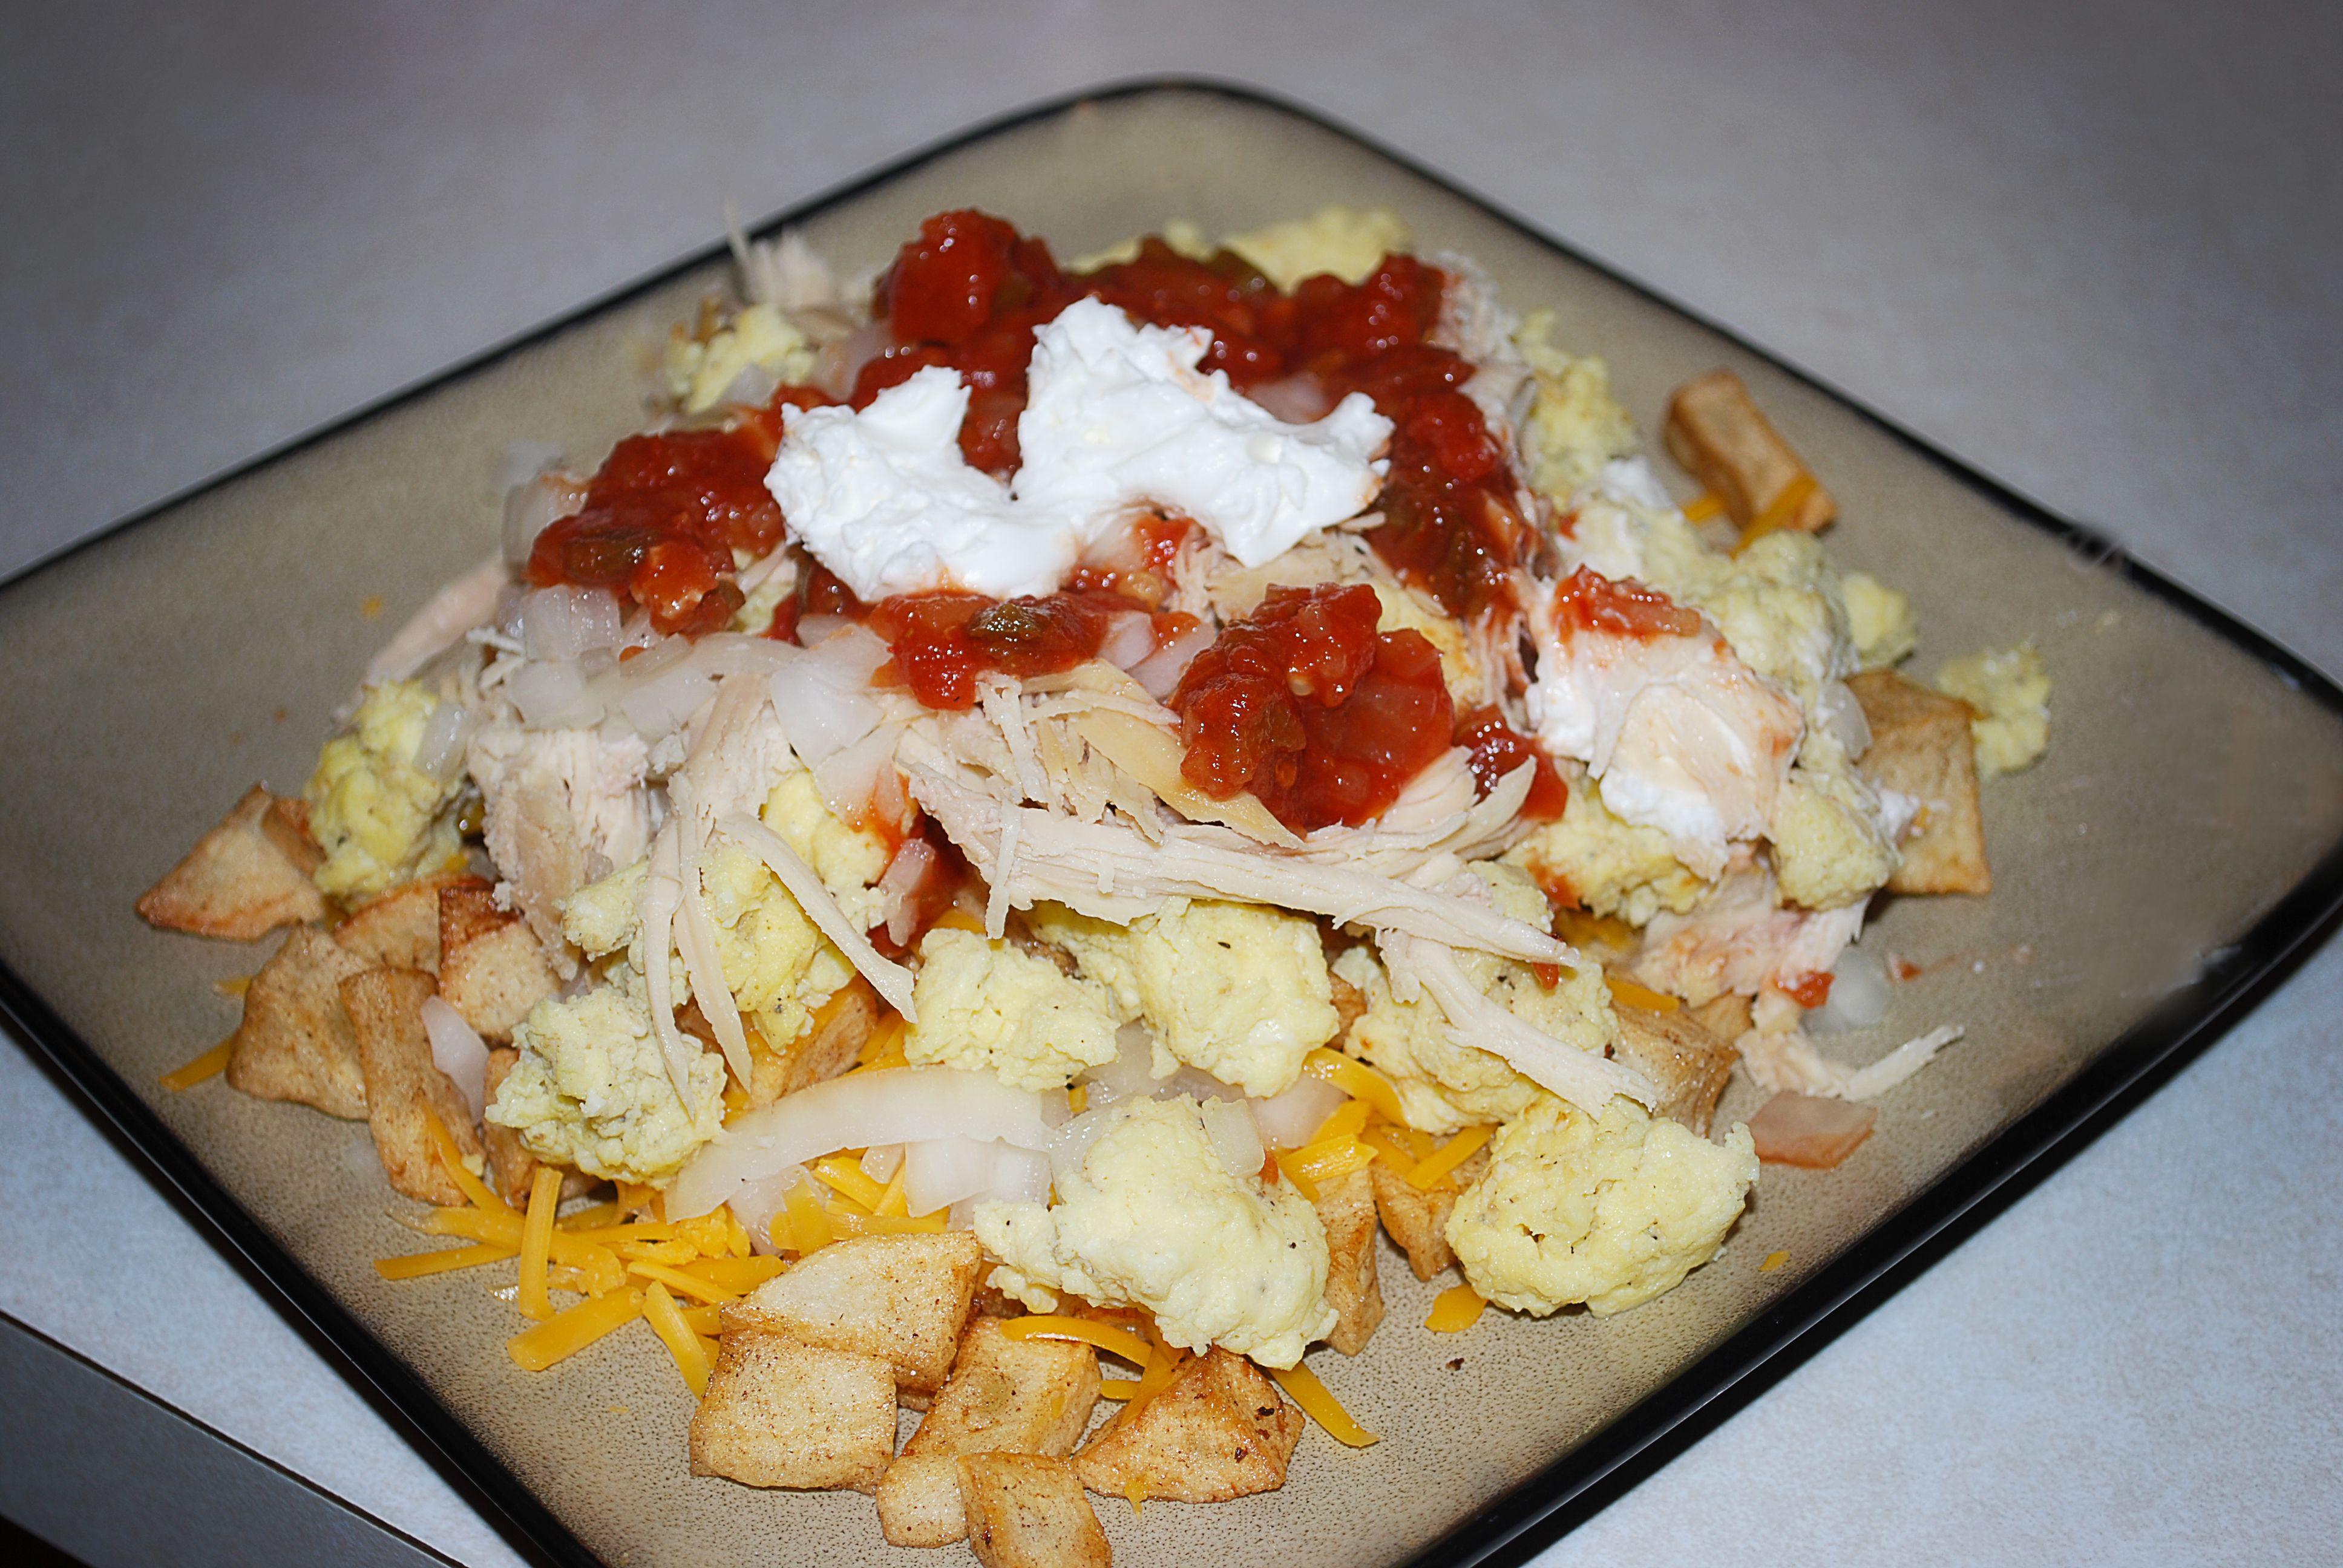 Chicken fajita sizzler yummy made with